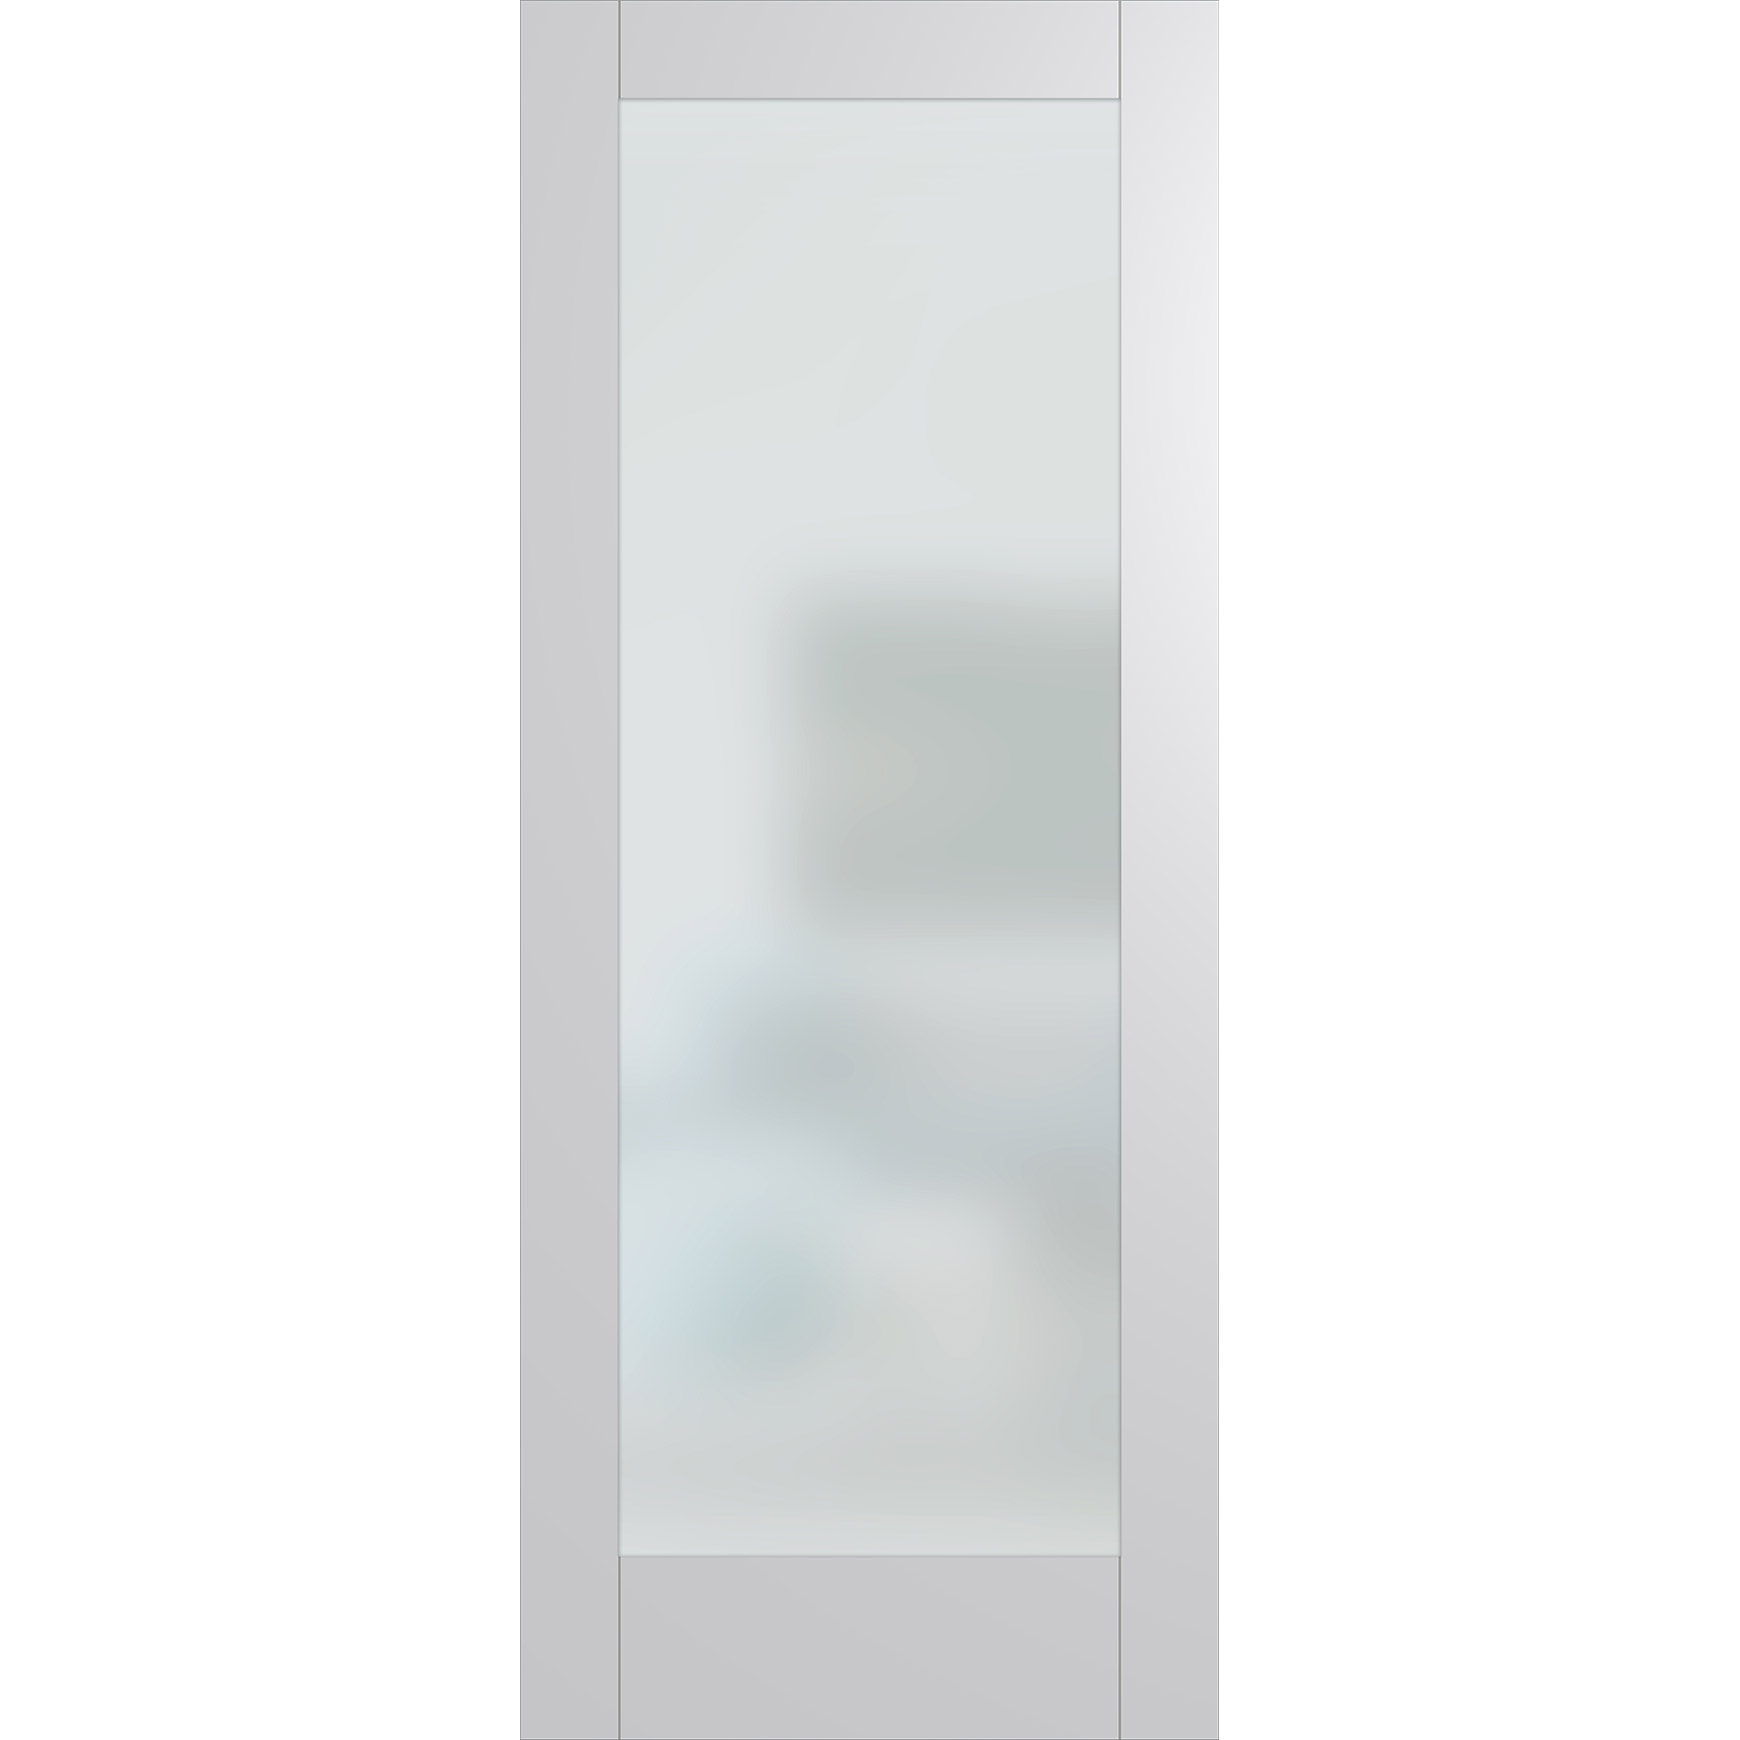 Hume Doors HAM1 White Frost